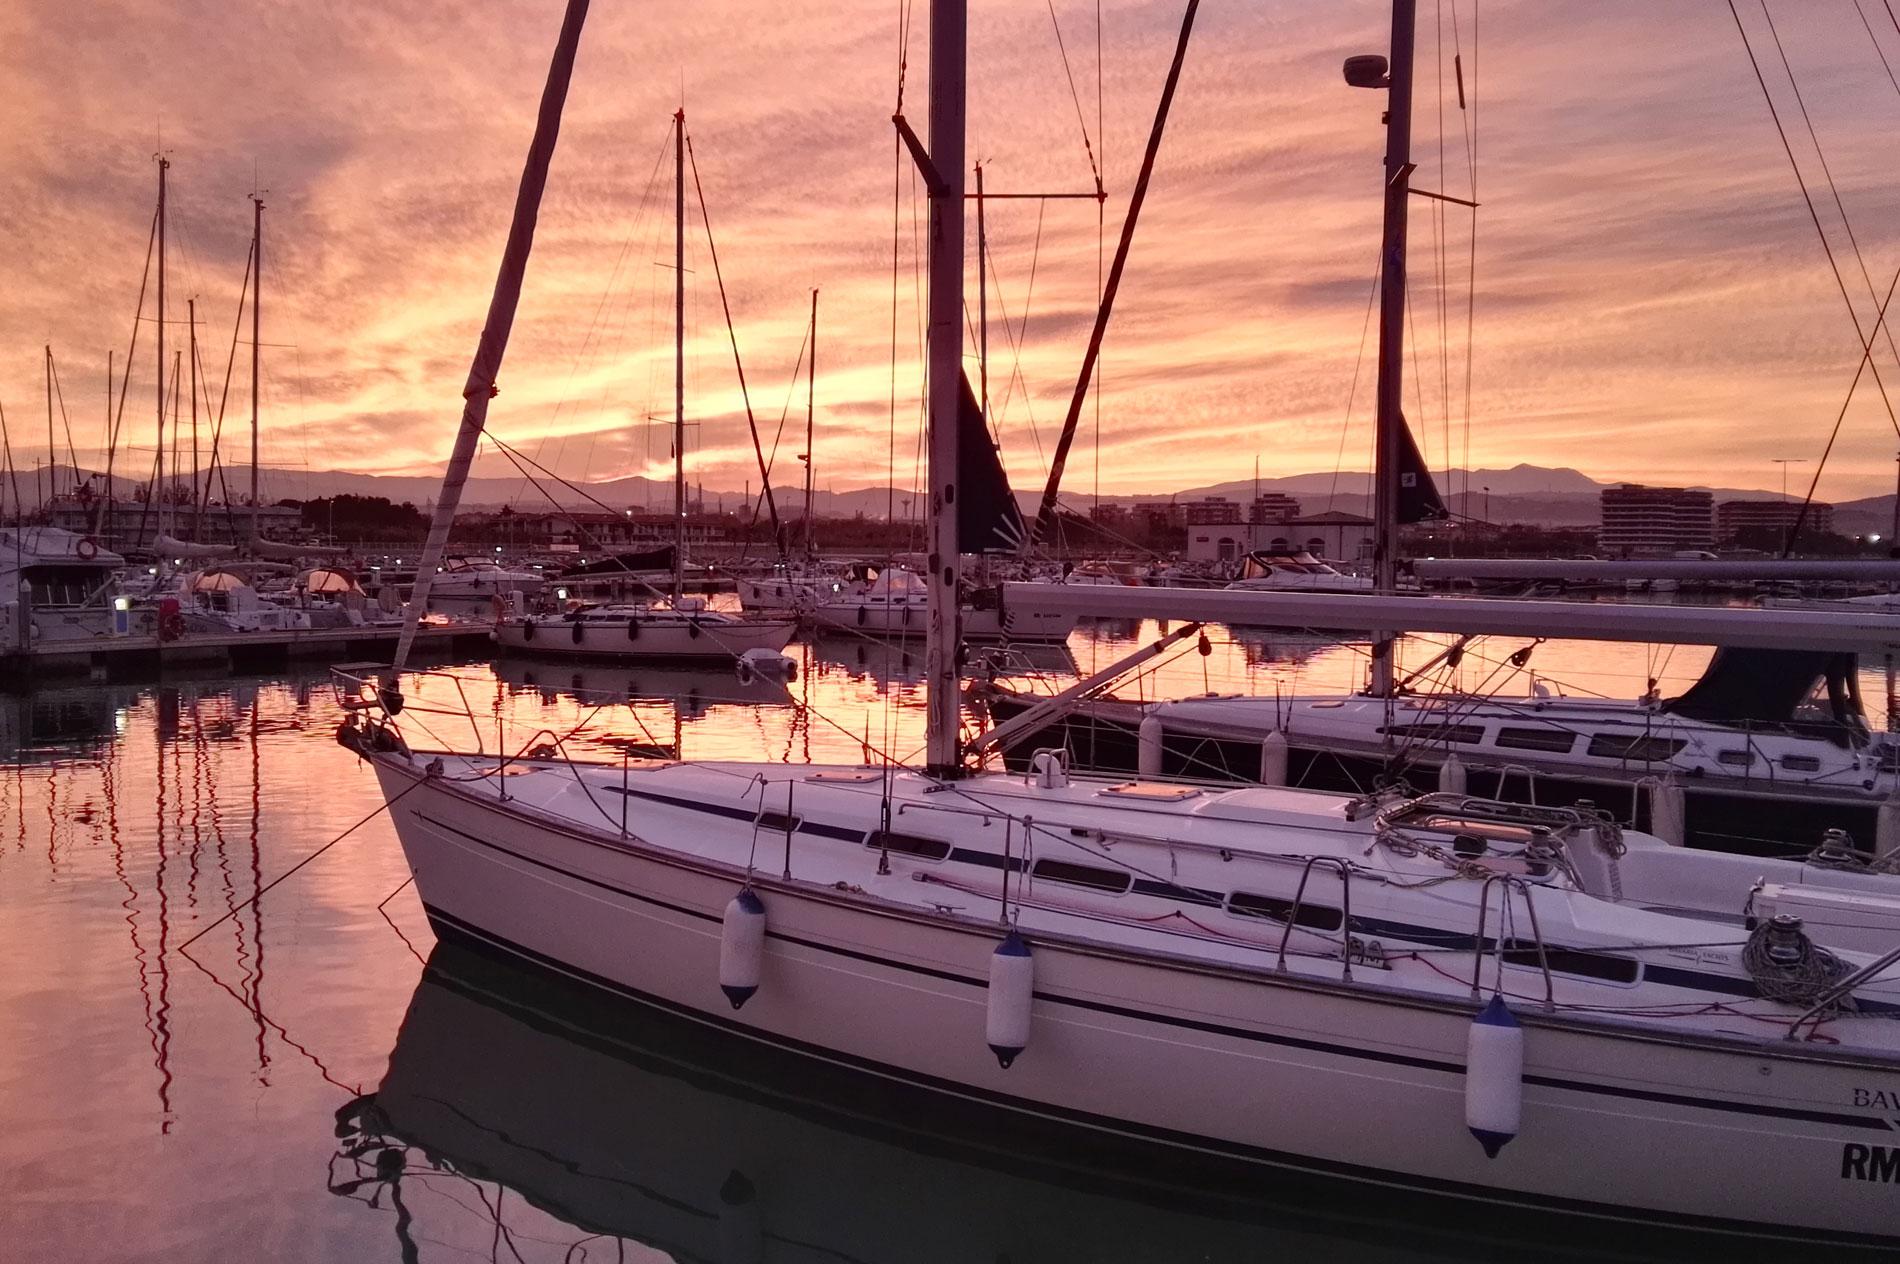 Porto-turistico-Marina-Sveva-Molise-H04